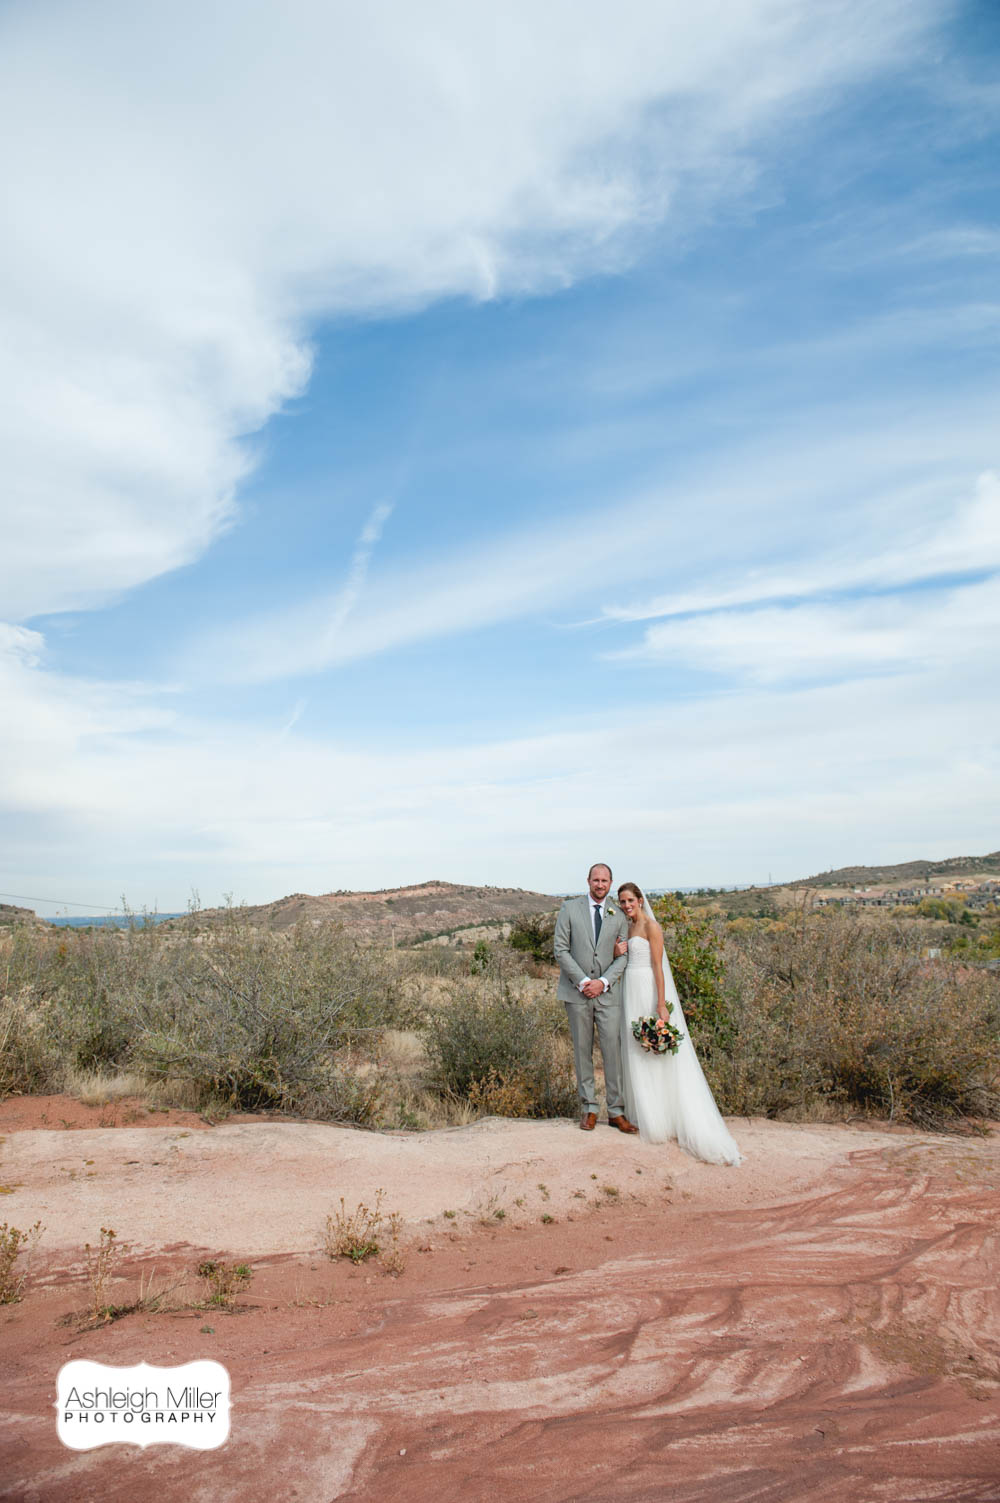 AMW-Wedding-EmilyRyan-WillowRidgeManor-4169-Blog.jpg